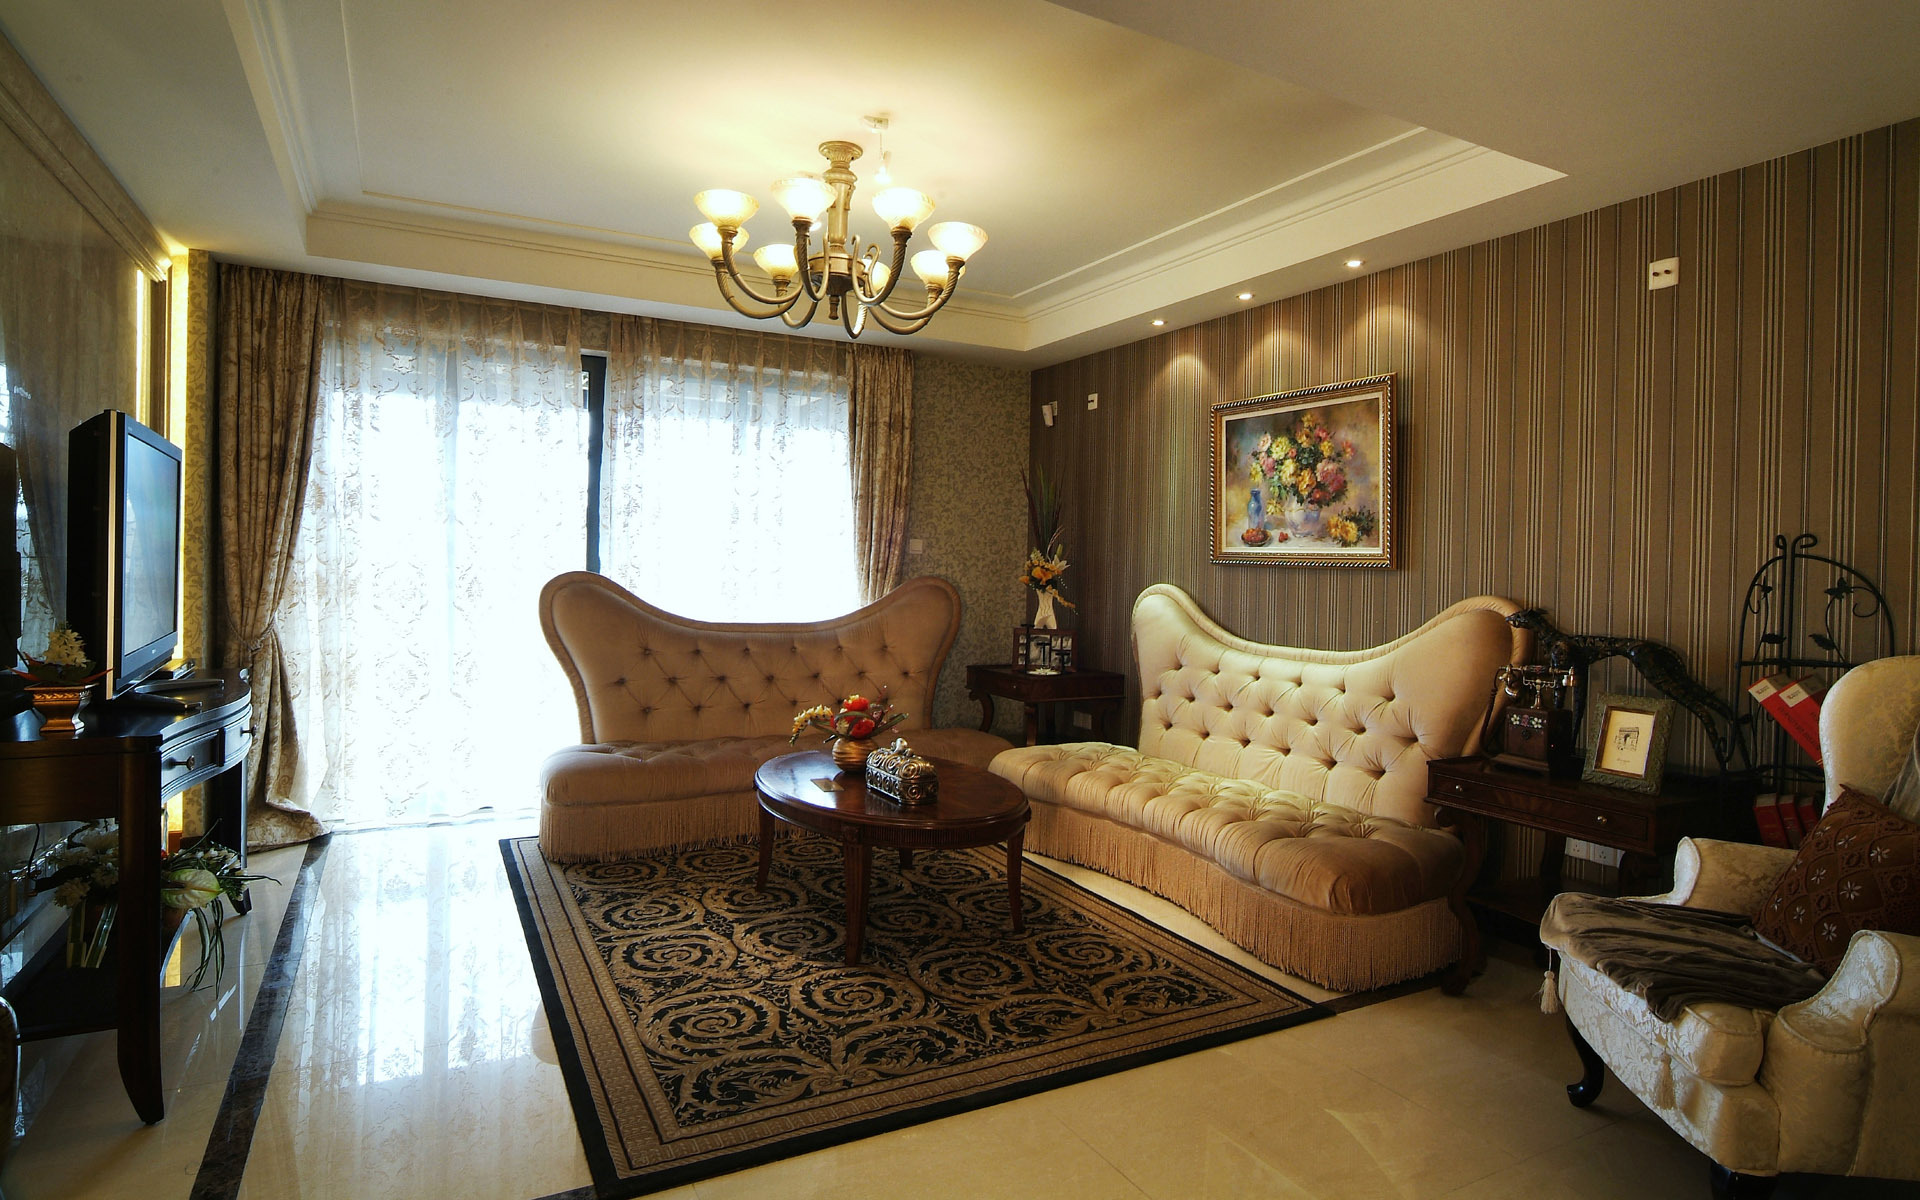 комната в коричневом стиле  № 1730716 без смс